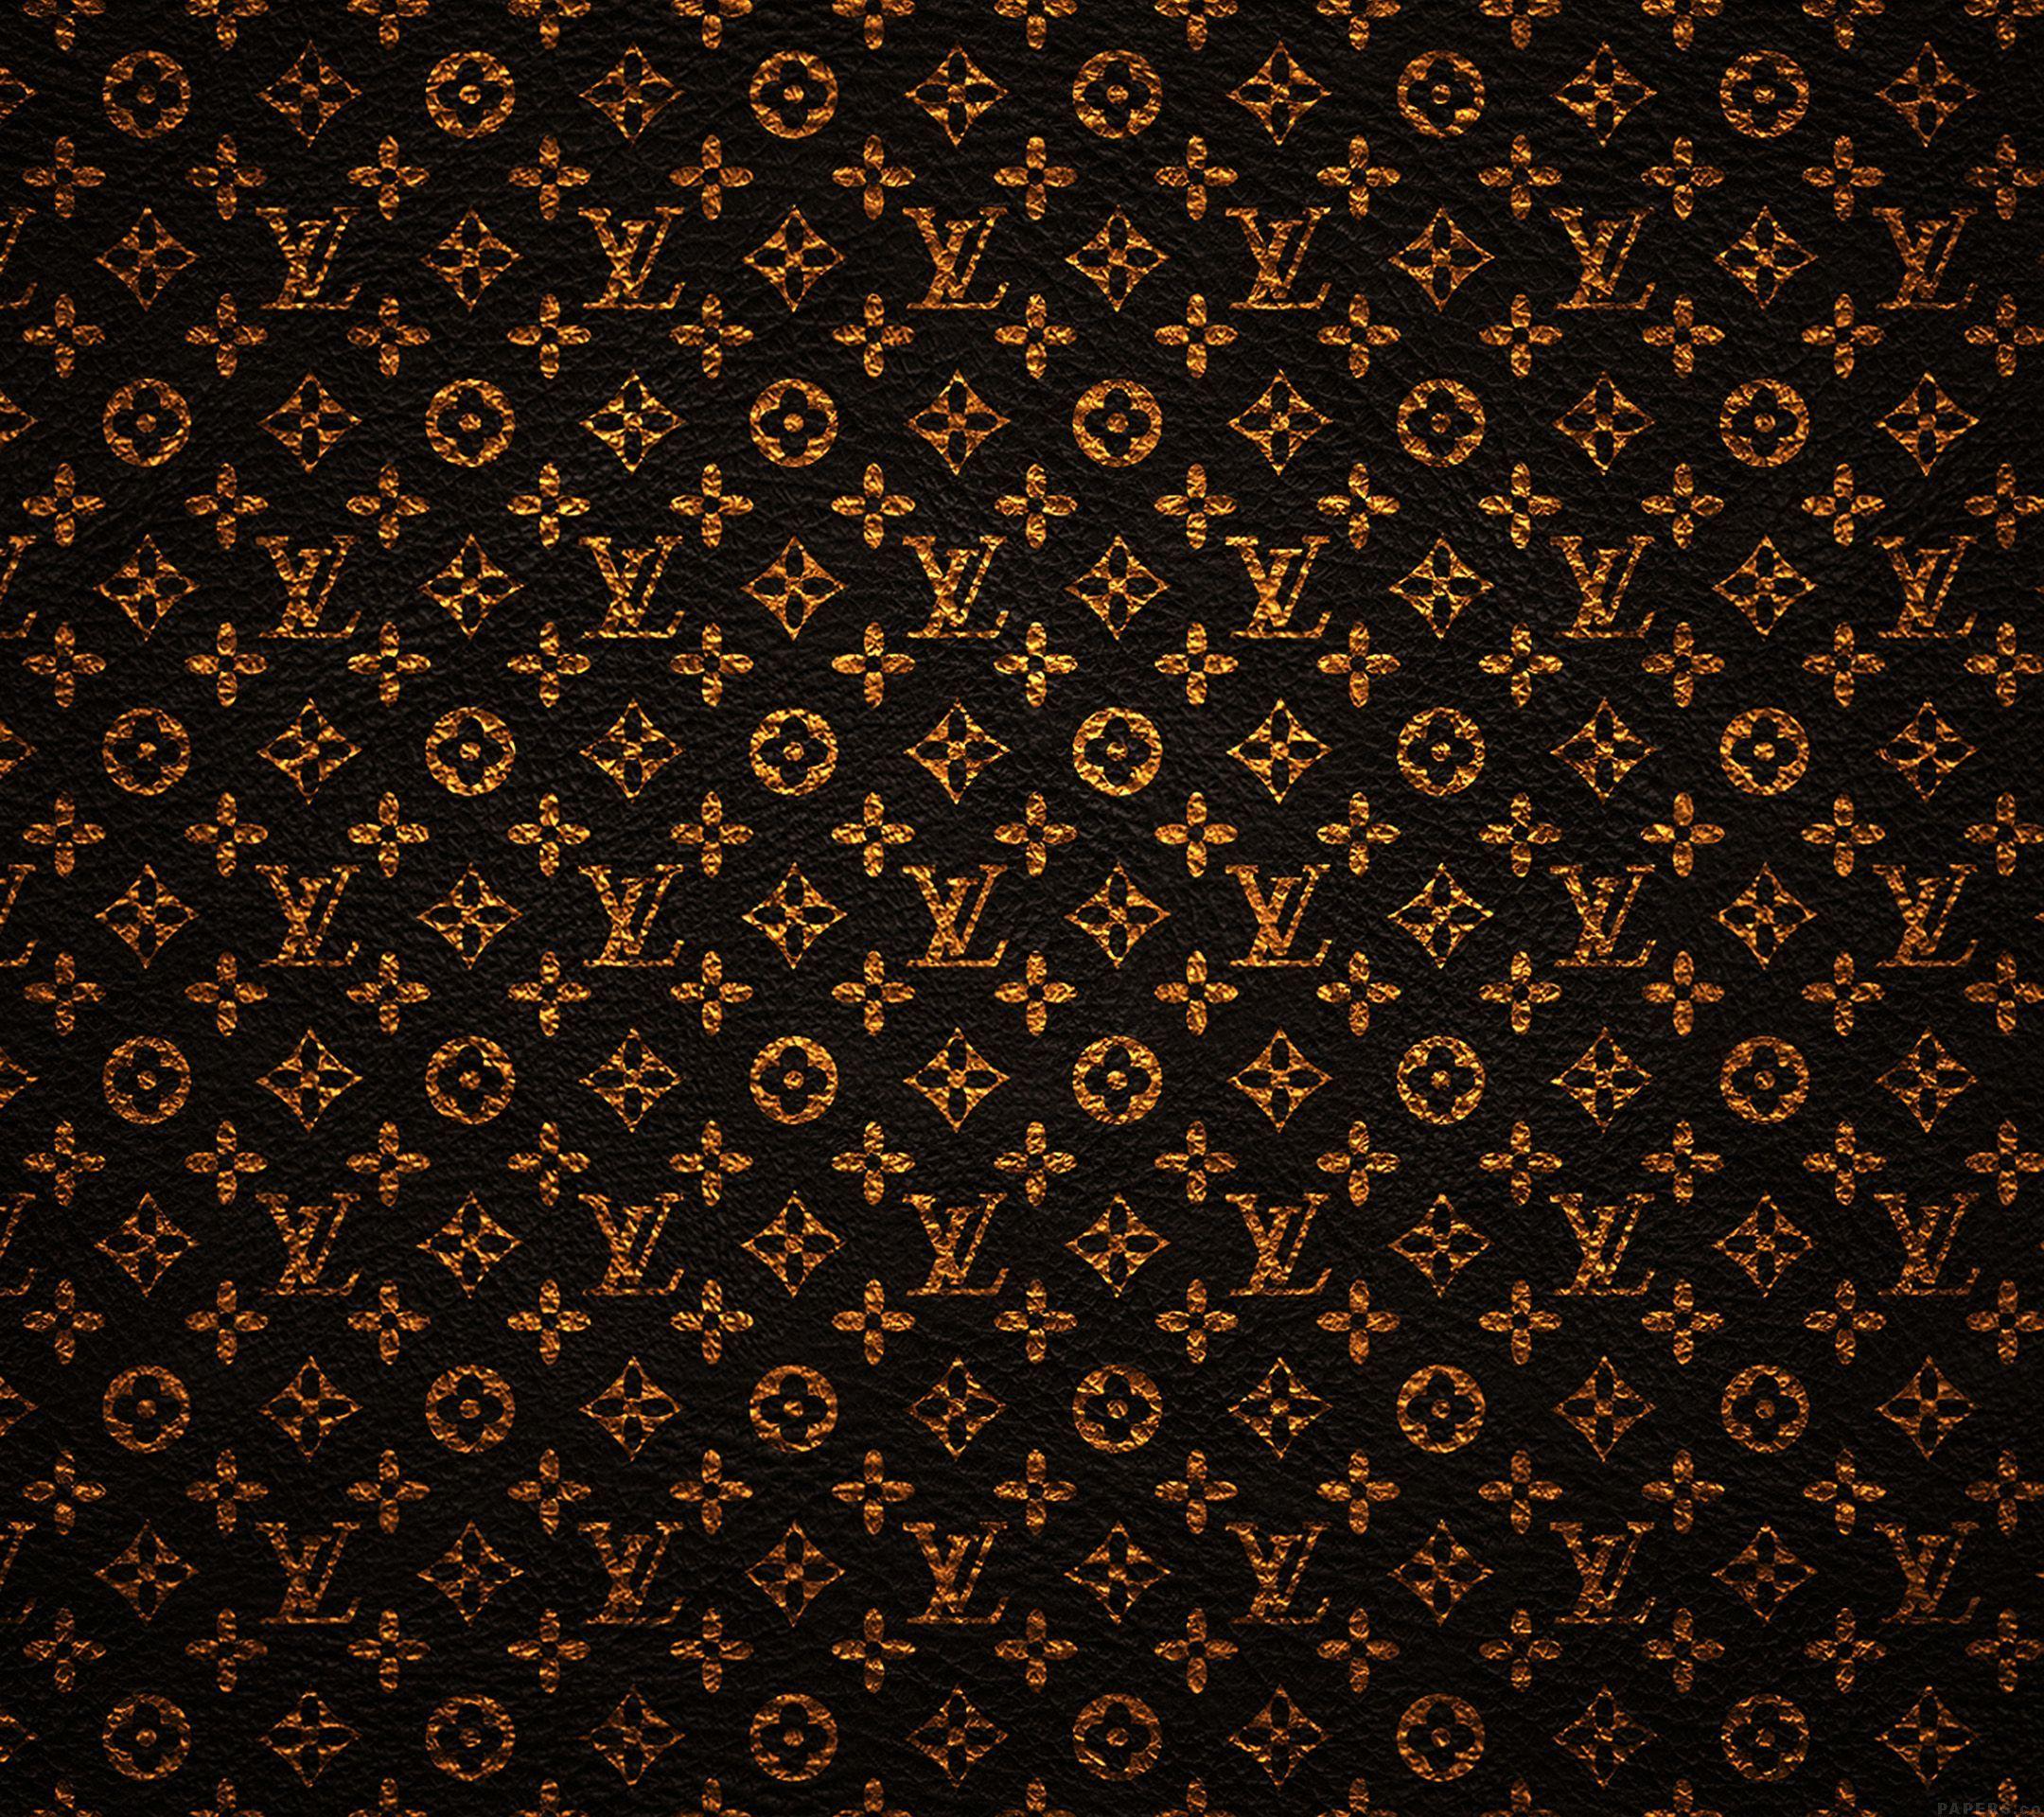 Louis Vuitton Print Wallpapers On Wallpaperdog